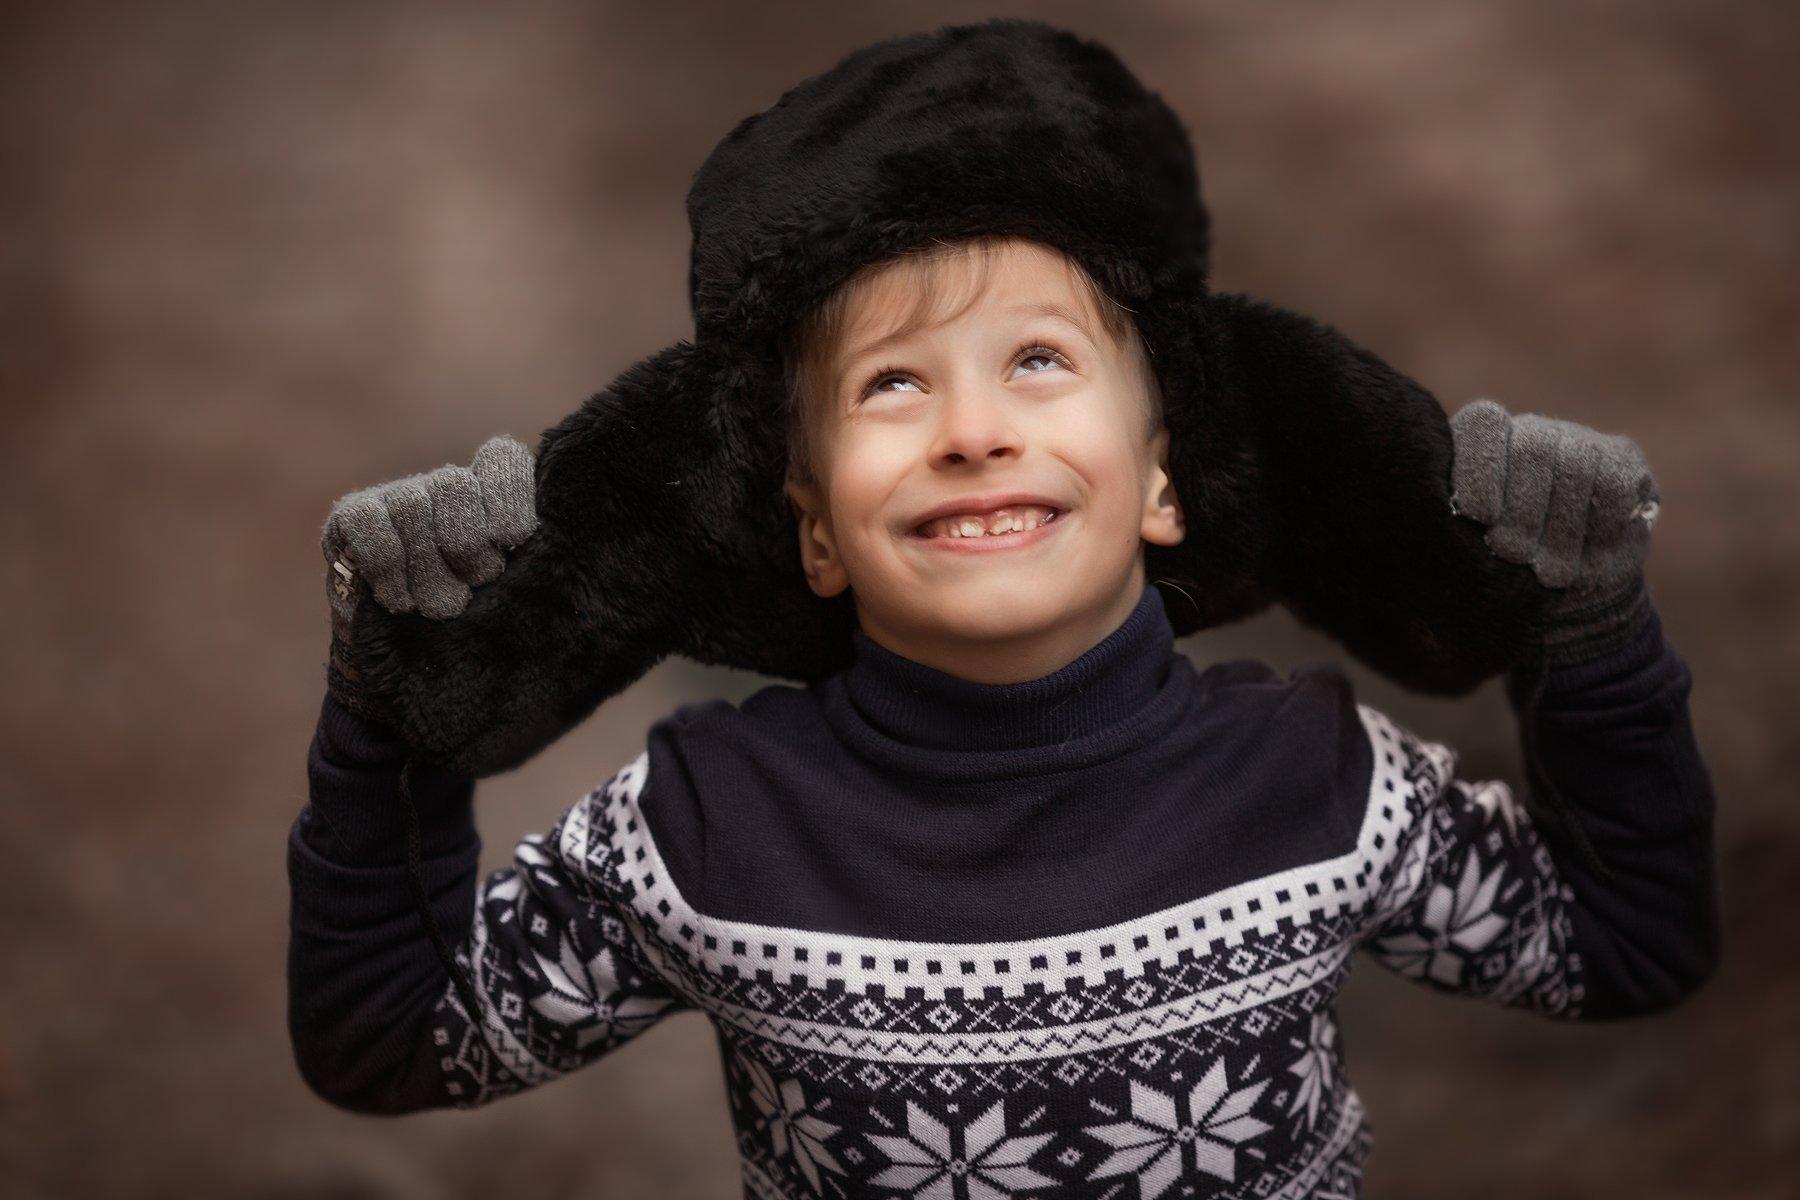 зима, мальчик, портрет, portrait, Ника Колесникова